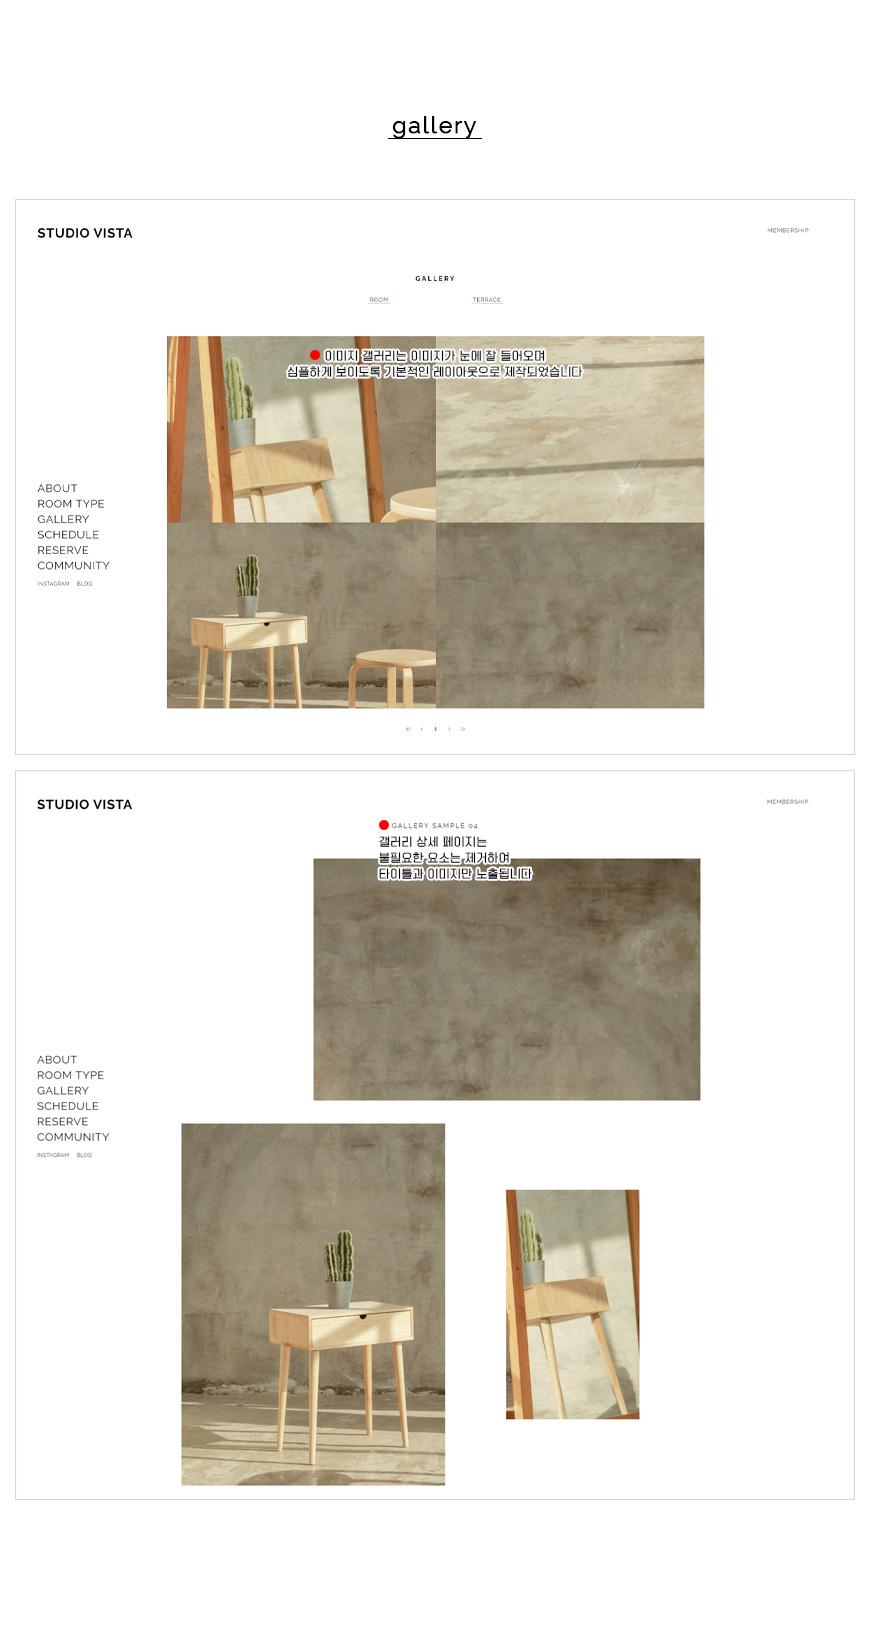 19_STUDIO_VISTA_detail